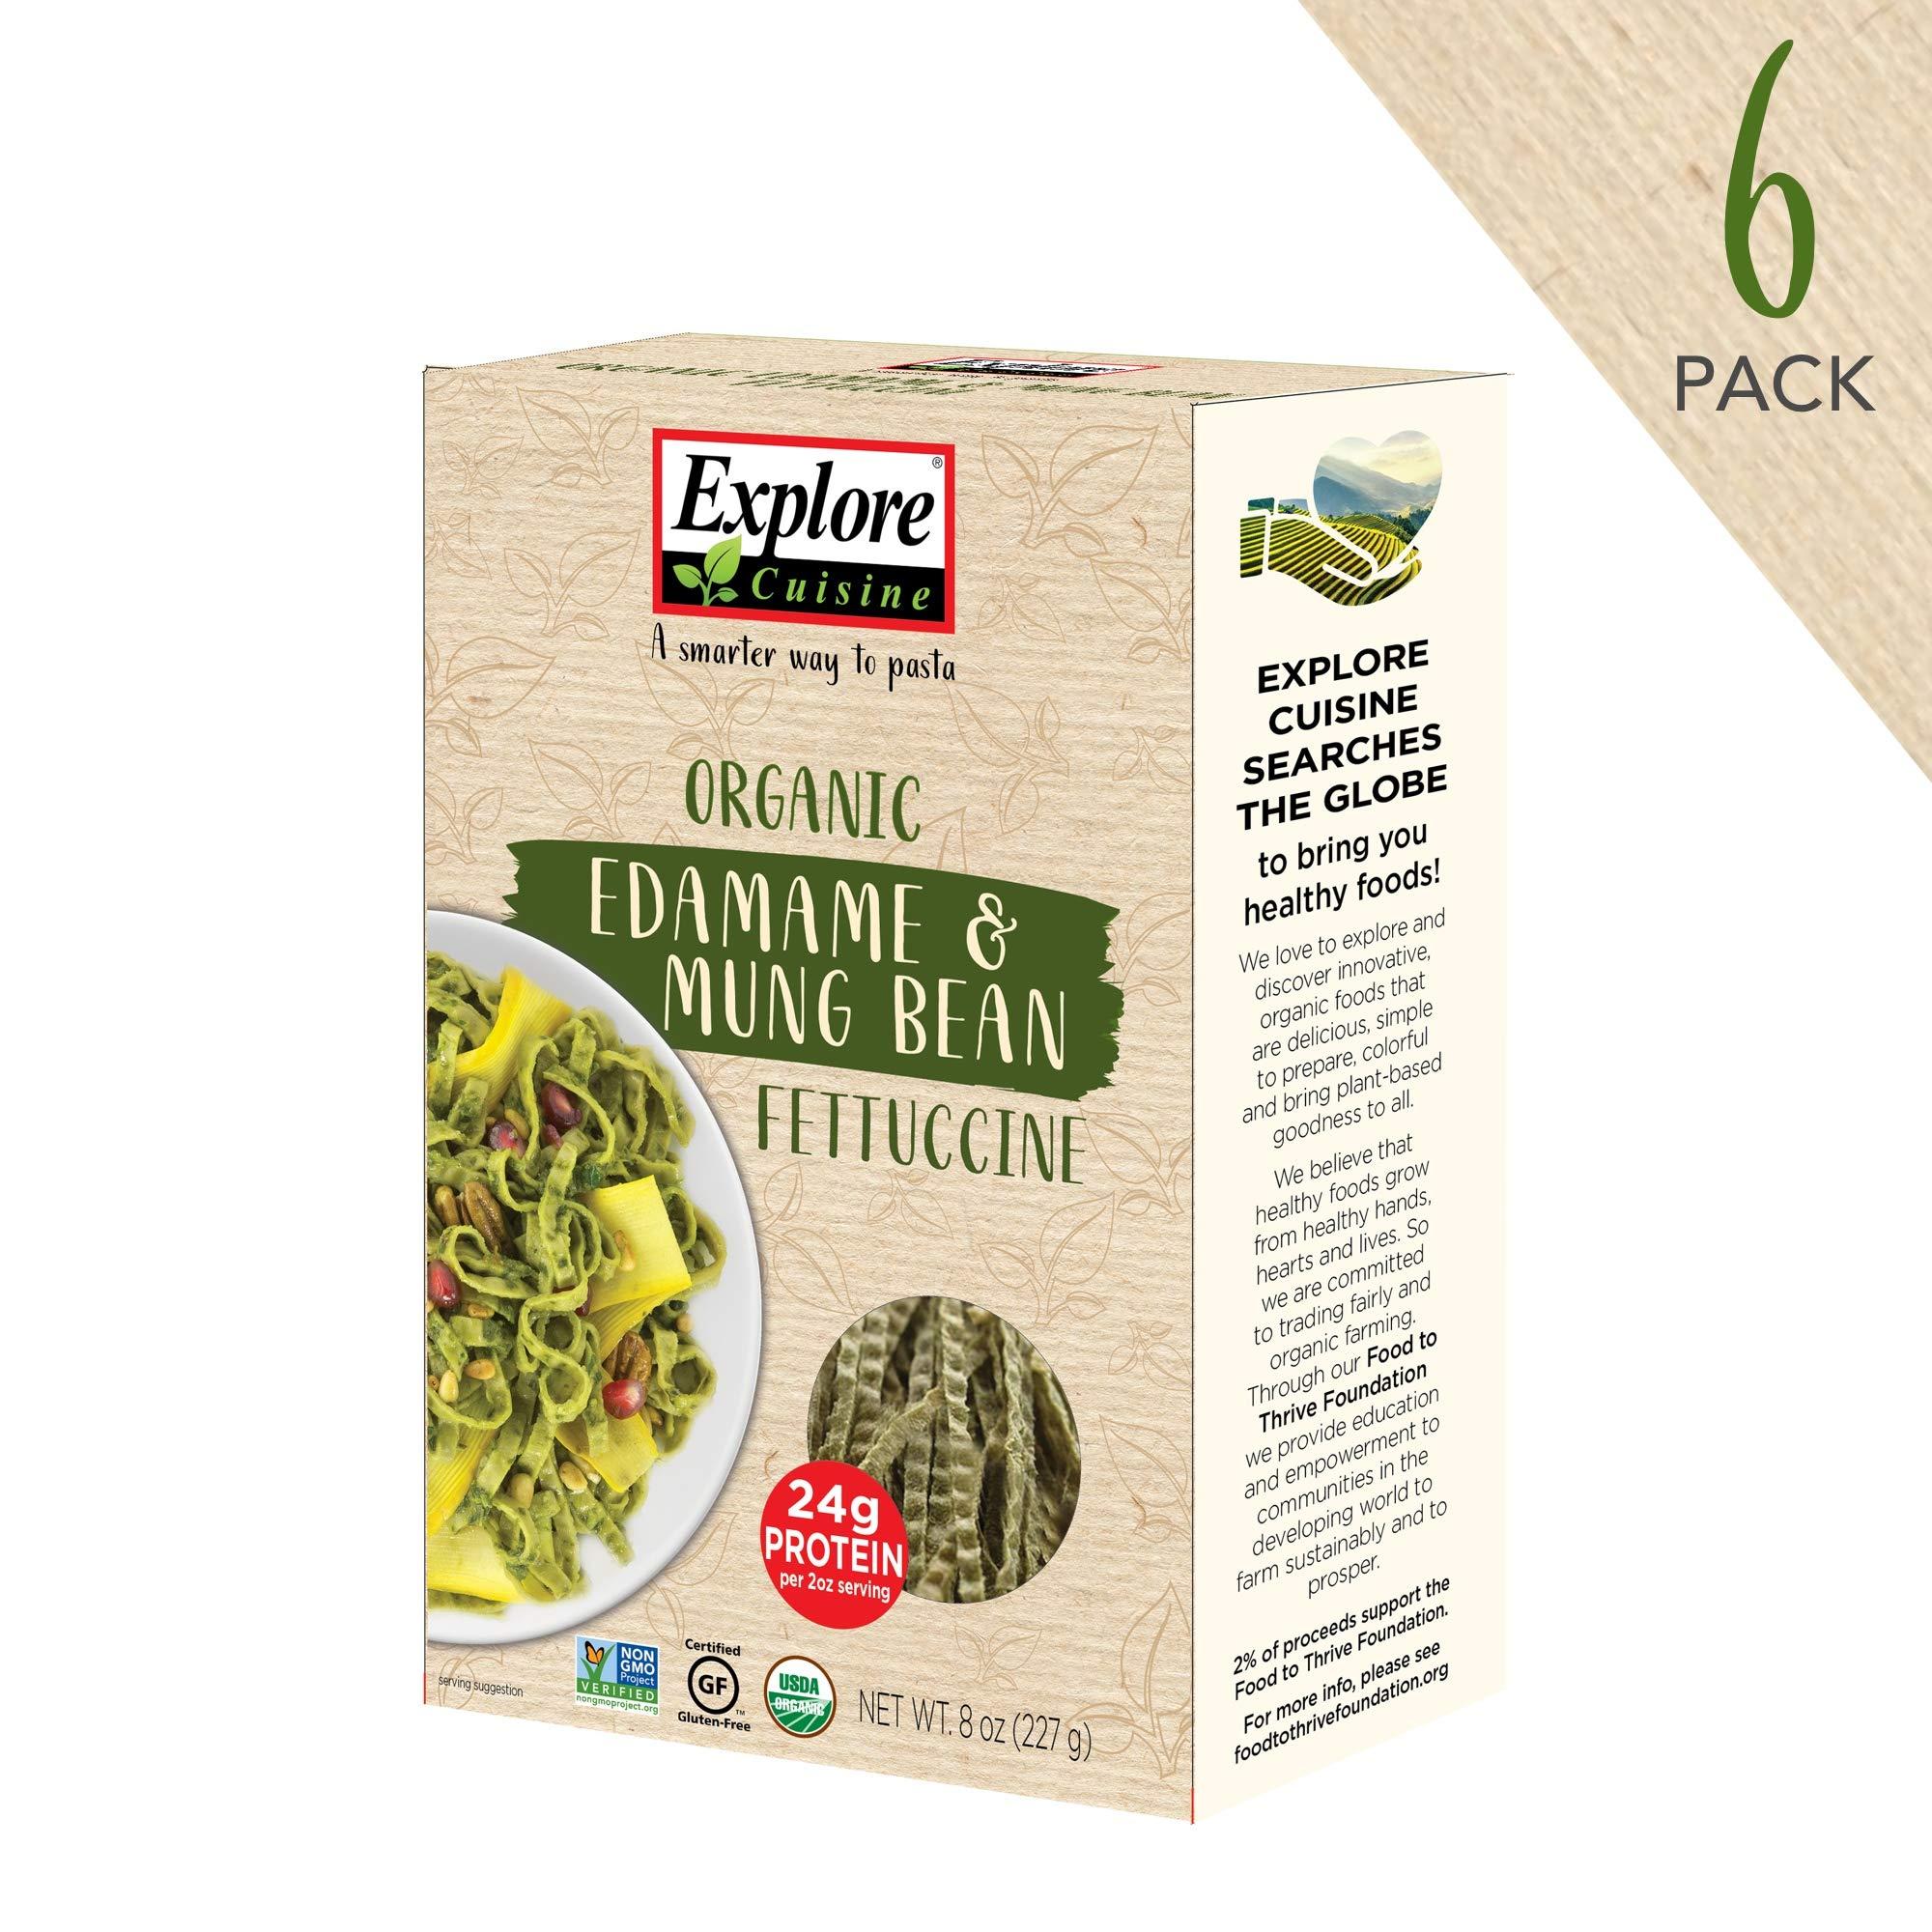 Explore Cuisine Organic Edamame & Mung Bean Fettuccine (6 Pack) - 8 oz - High Protein, Gluten Free Pasta - USDA Certified Organic, Vegan, Kosher, Non GMO - 24 Total Servings by EXPLORE CUISINE